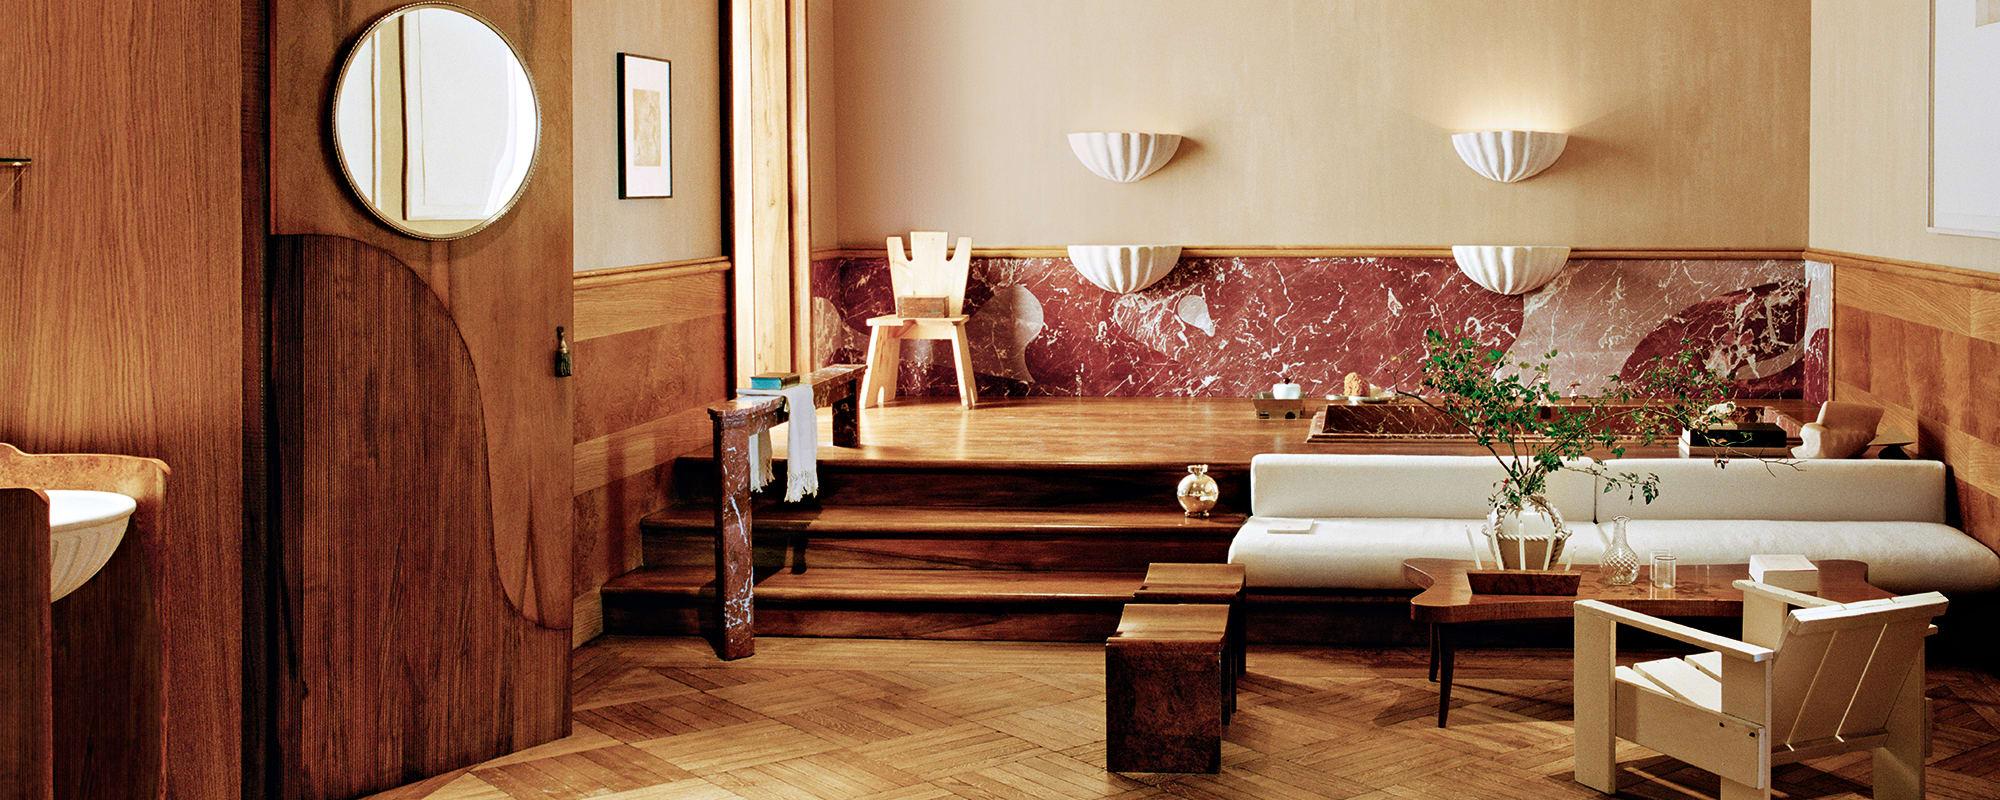 AD, Interiordesigner, Interior, Festen, Hugo Sauzay, Charlotte de Tonnac